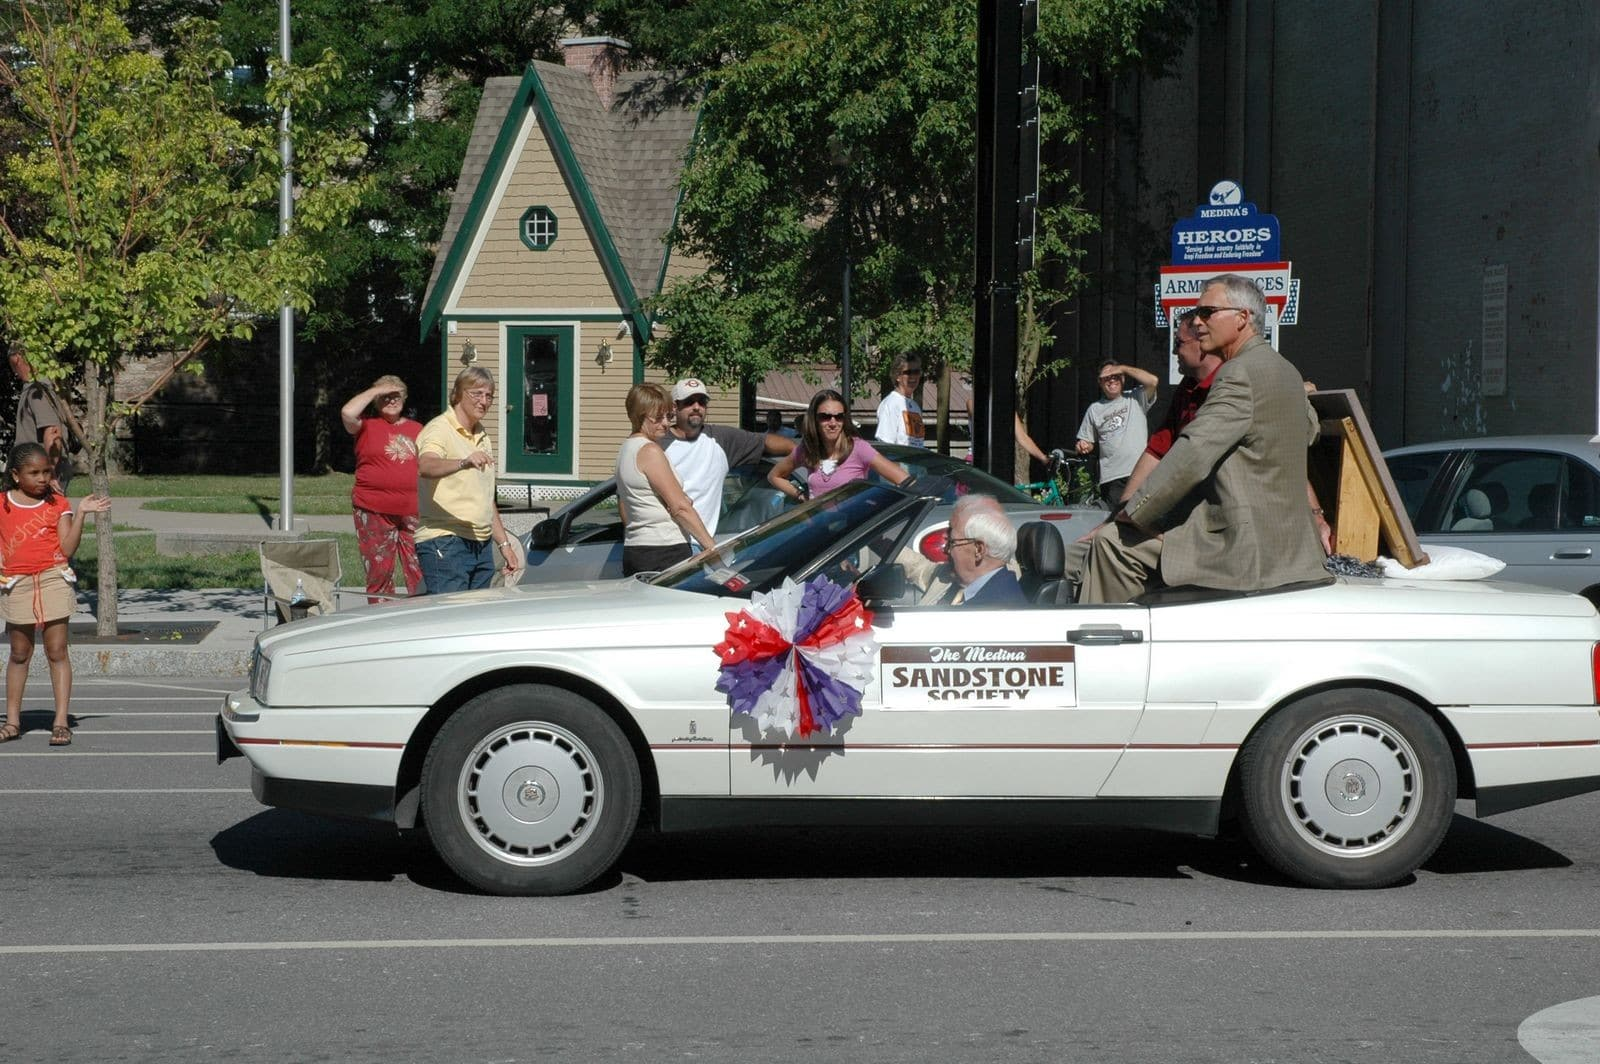 The Medina Sandstone Society participates in local parades